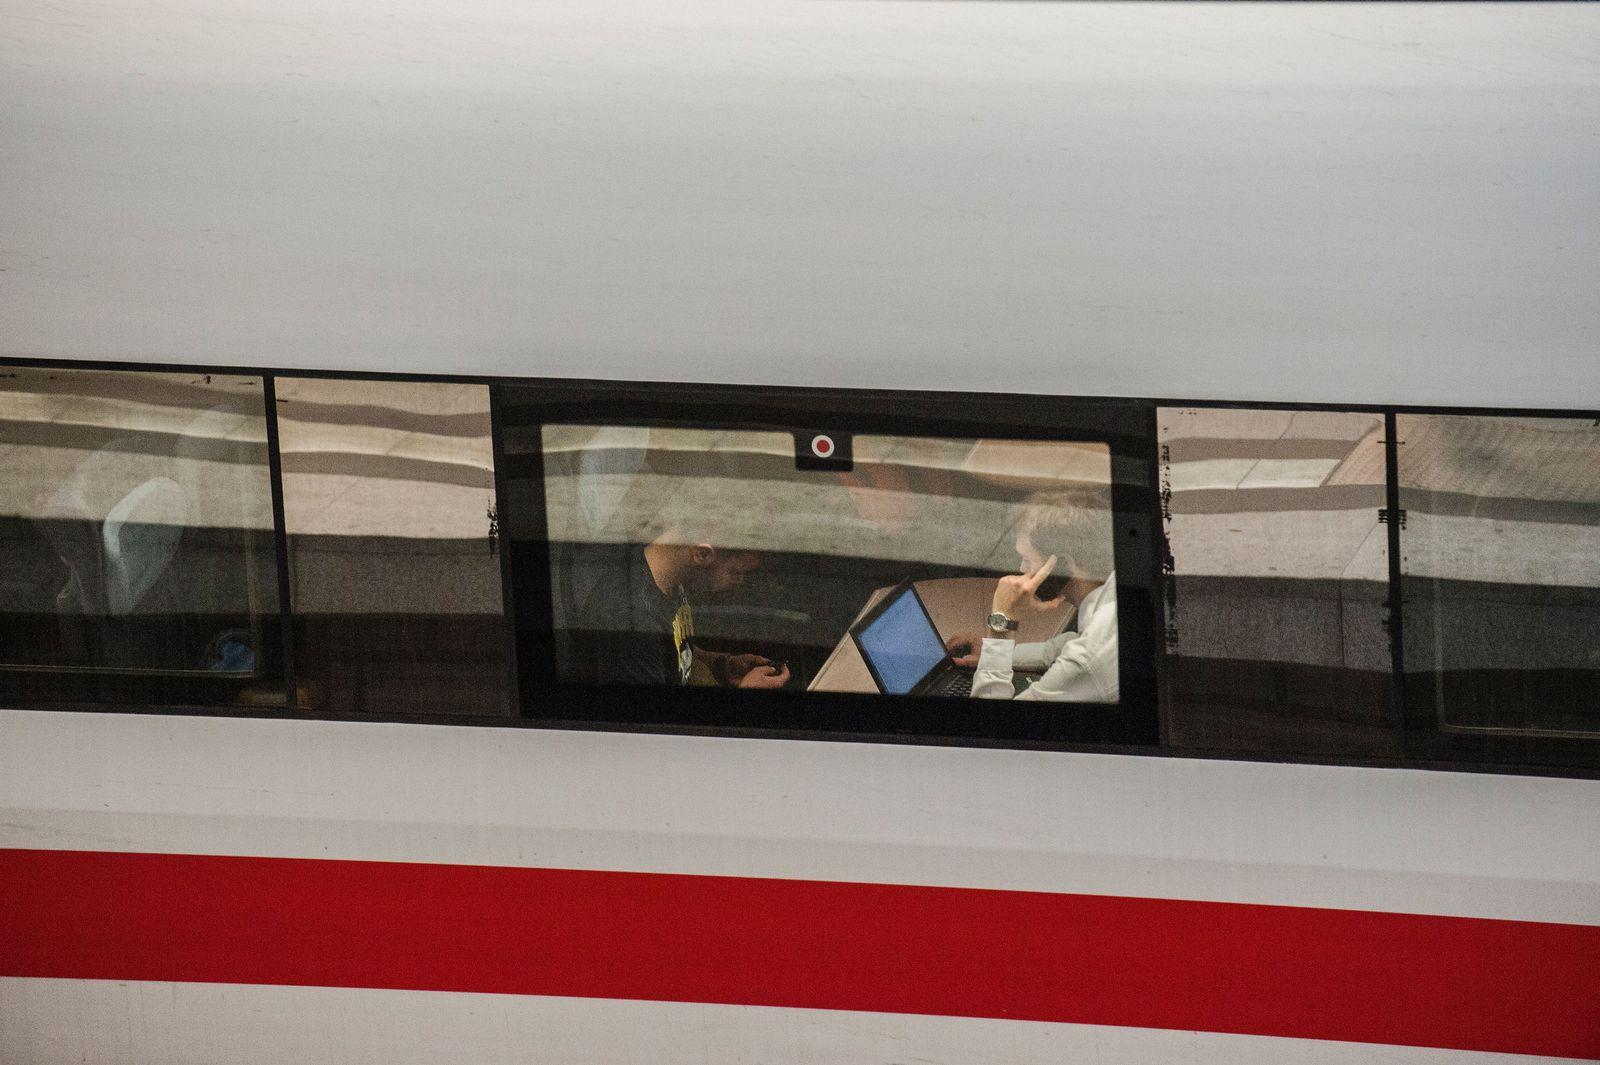 Bahn Berlin Hamburg